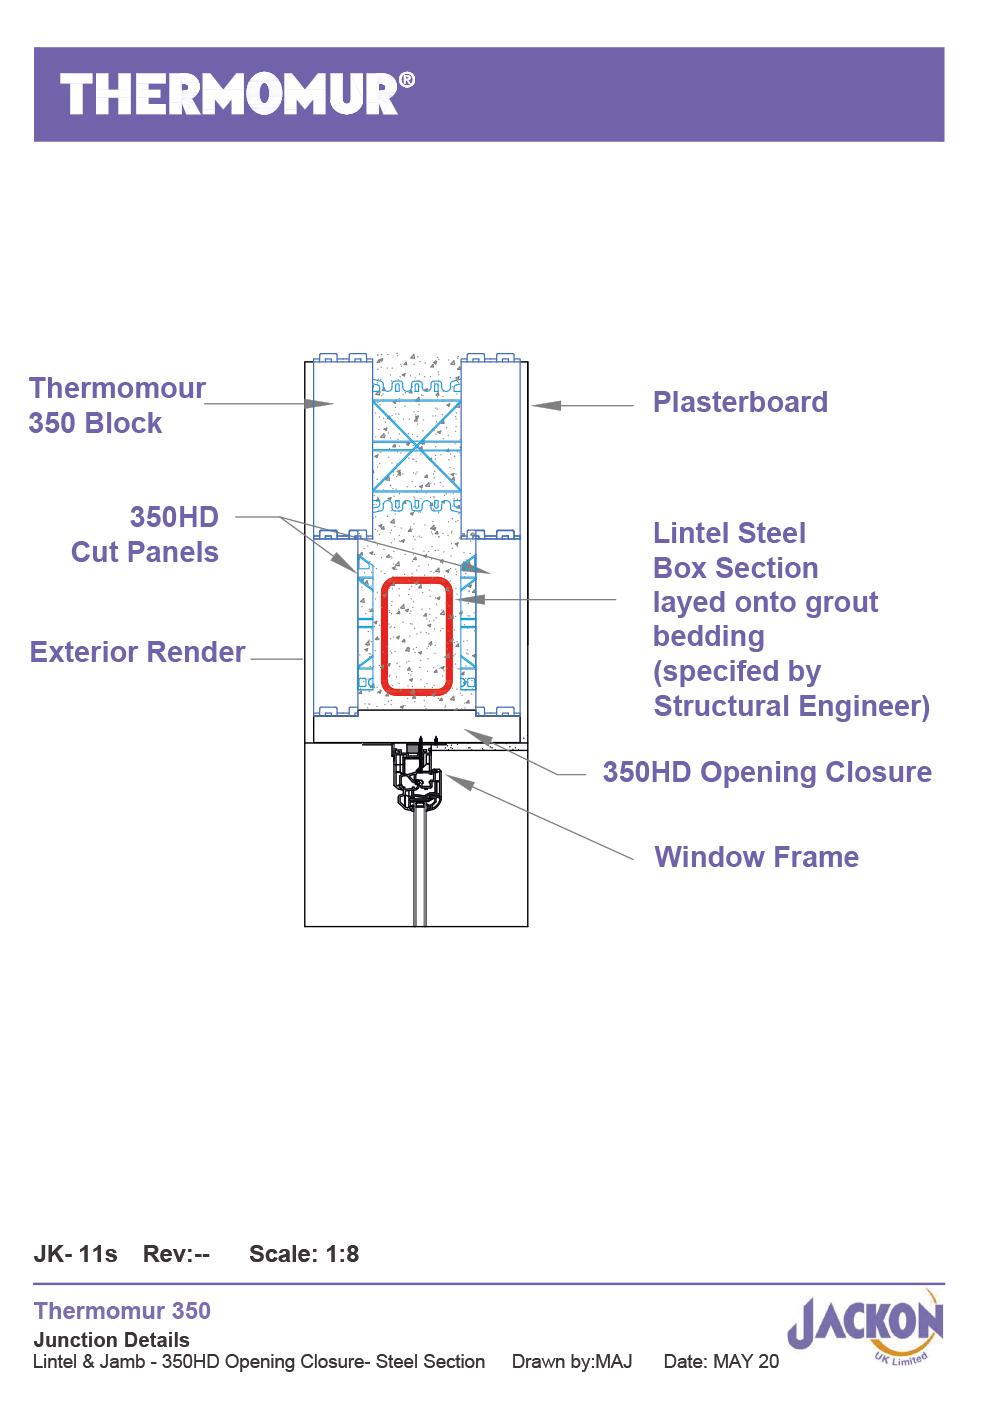 JK-11s Lintel & Jamb-350HD Opening Closur- Steel Section